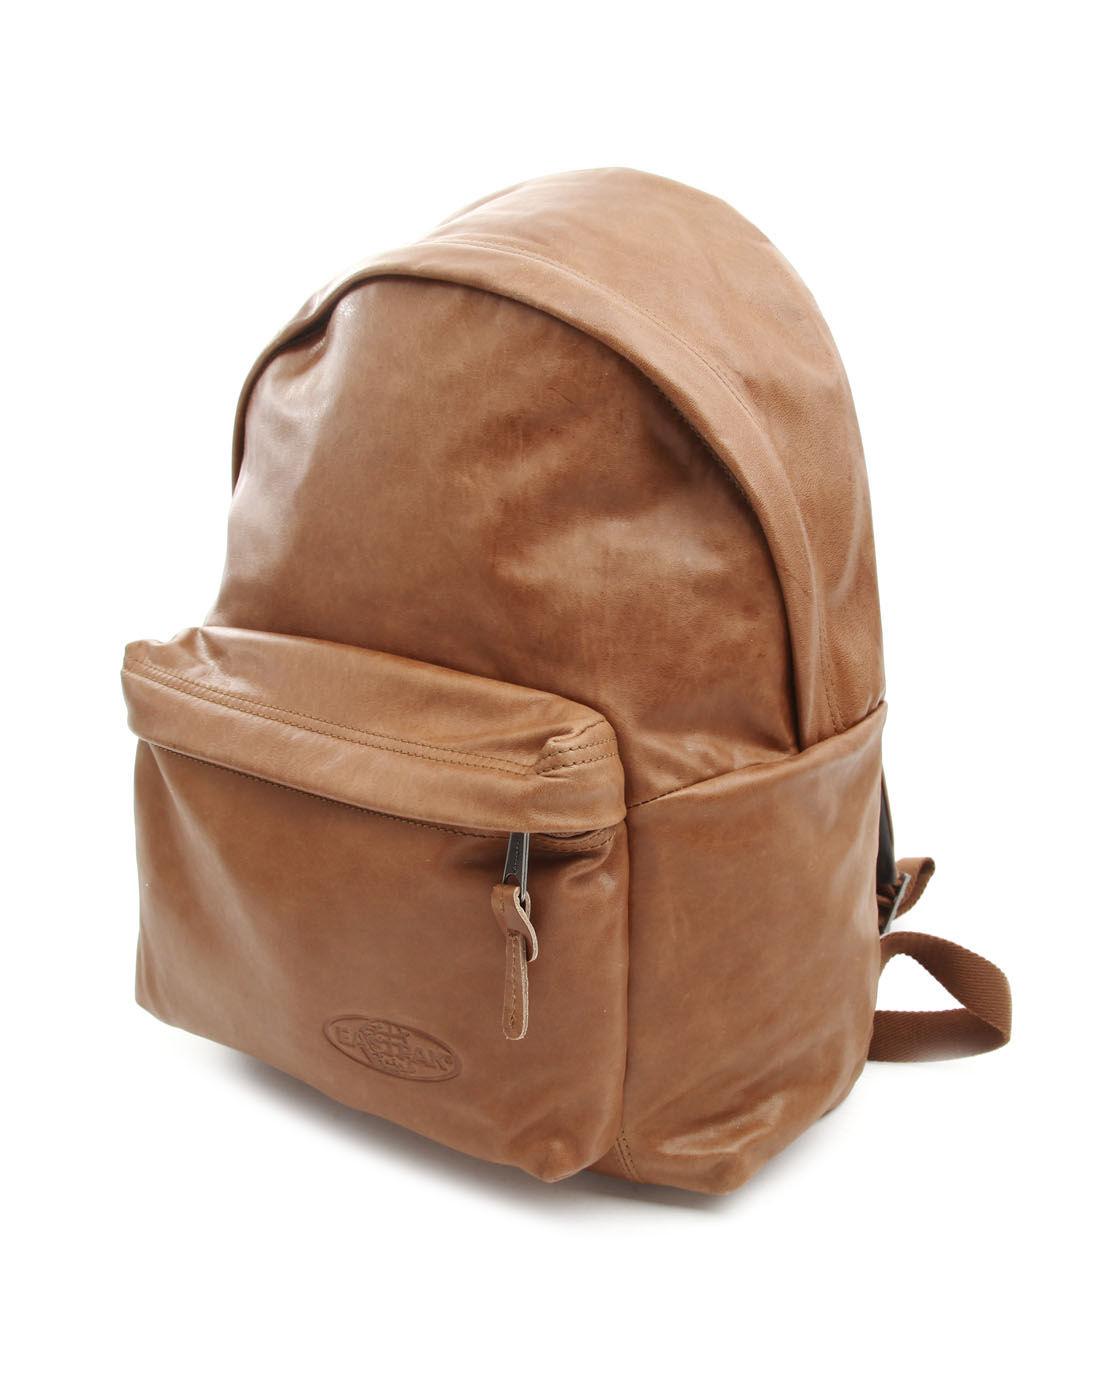 Leather Eastpak Backpack: Eastpak Padded Pak'R Camel Leather Backpack In Brown For